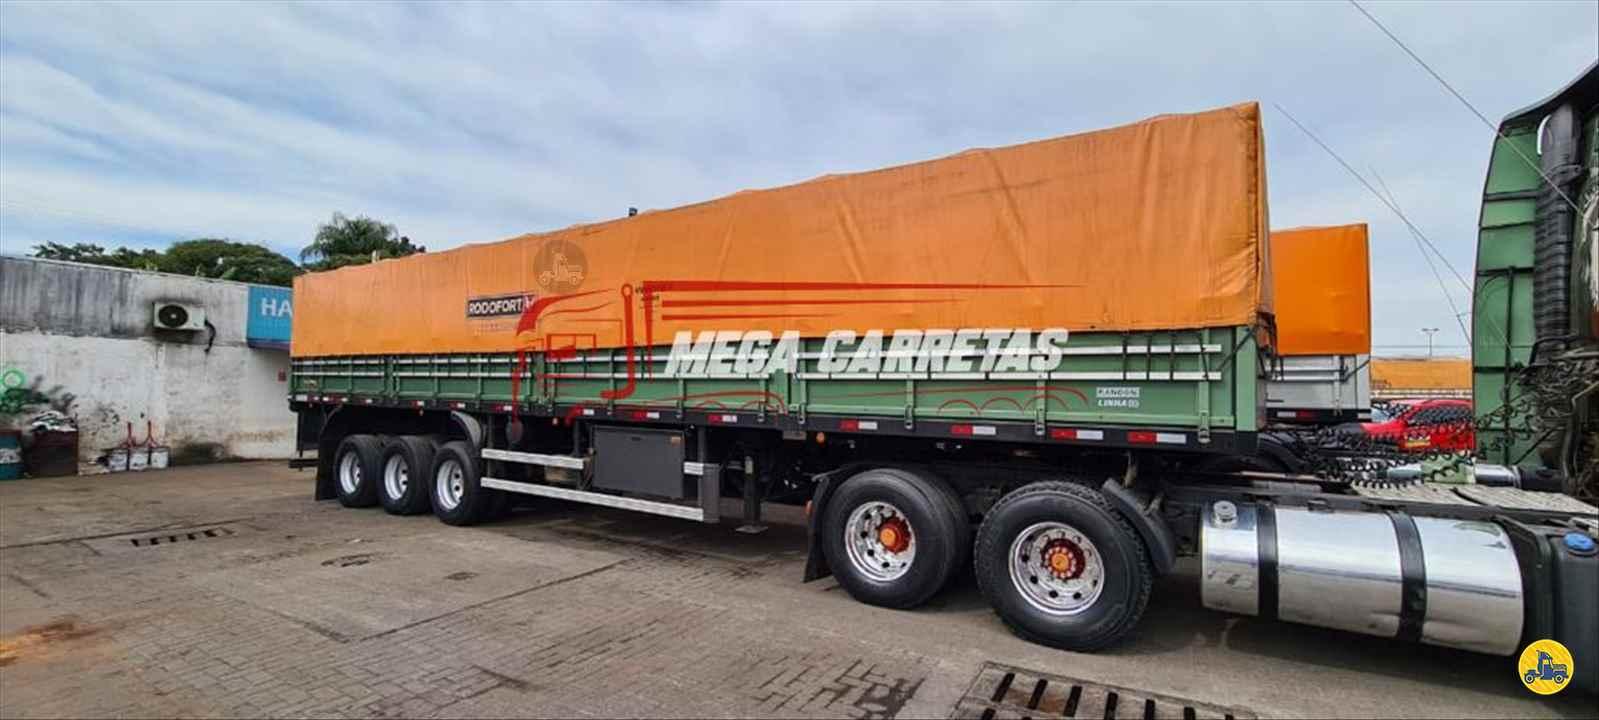 GRANELEIRO de Mega Carretas - COLOMBO/PR